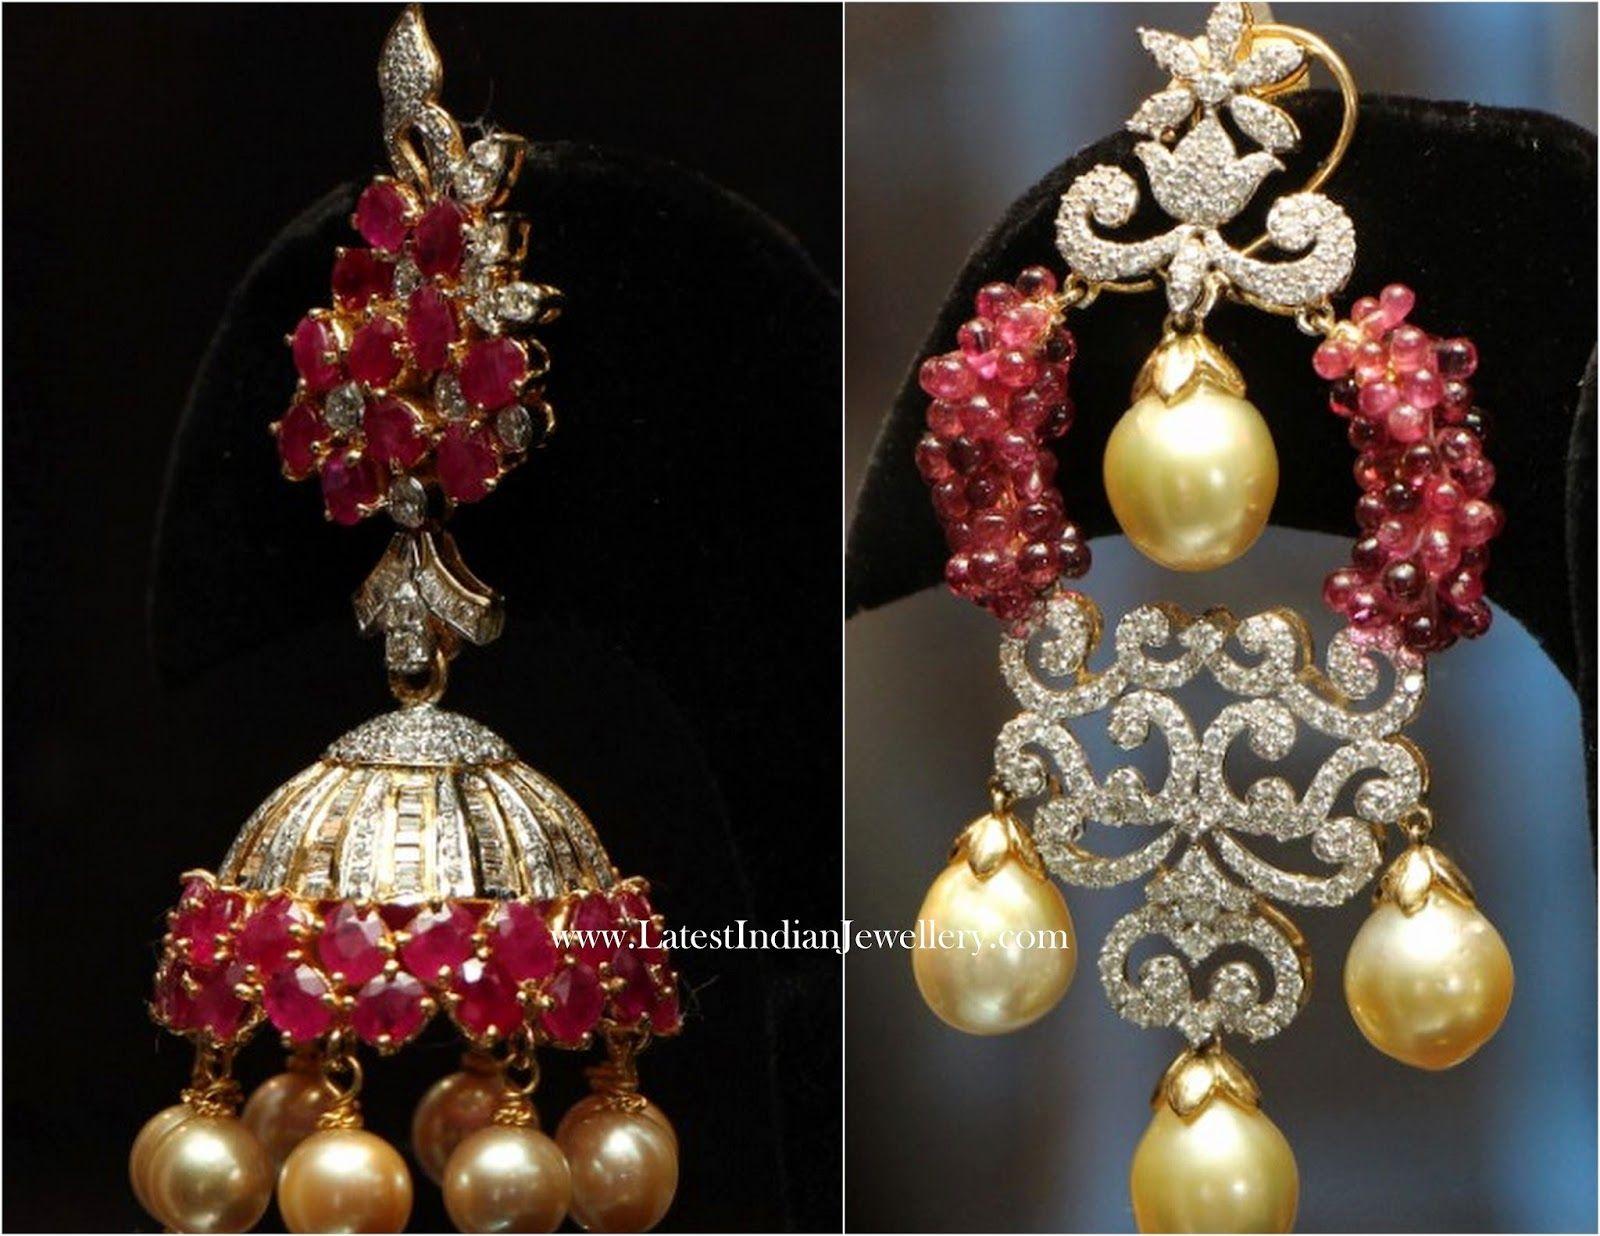 b13a0cf32412e Diamond Ruby Jhumka and Chandbali Earrings   jewelery 2   Jewelry ...